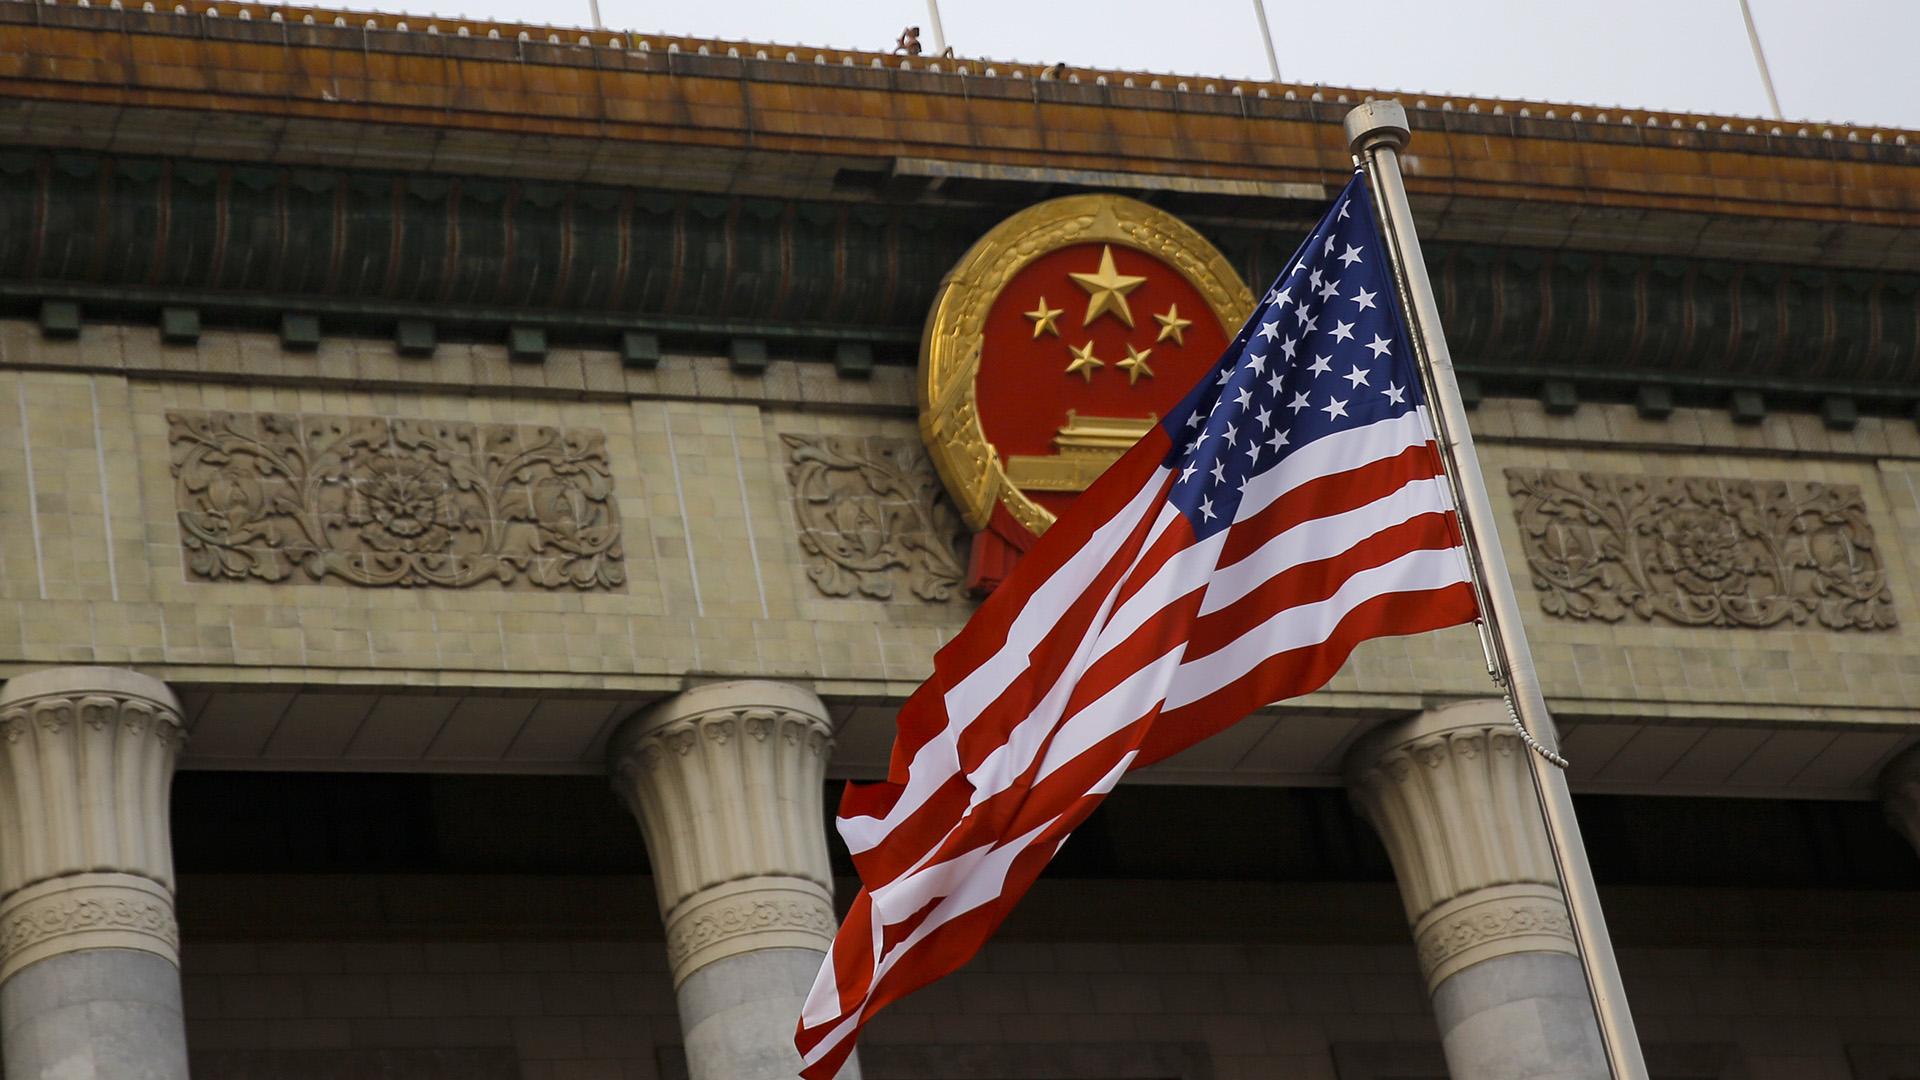 Chinese Regulator Investigates U.S. Listed Boss Zhipin And Full Truck Alliance